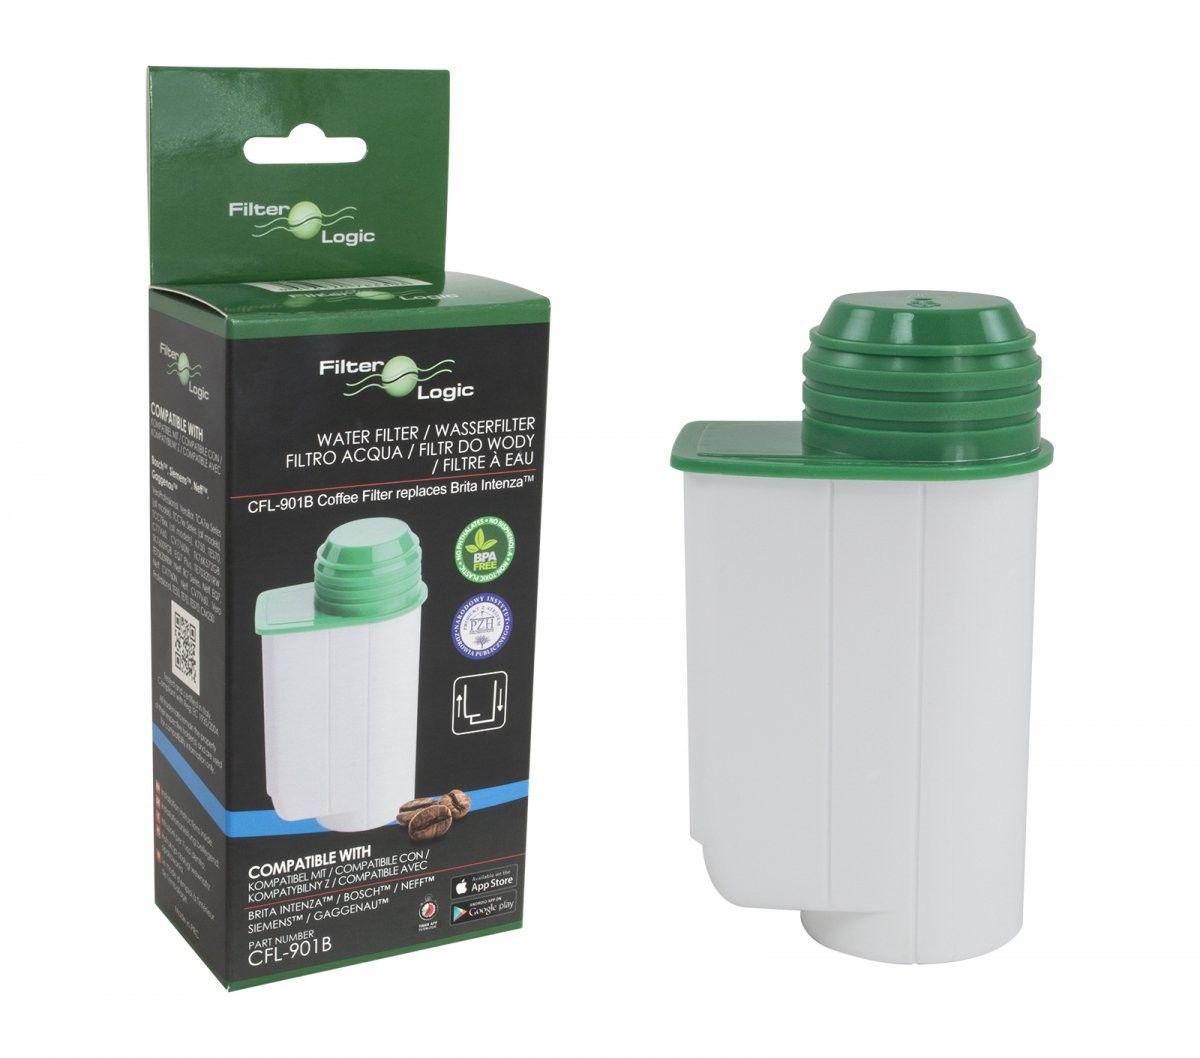 Filtr wody Brita Intenza+ CA6702 ekspresu do kawy 5szt FilterLogic